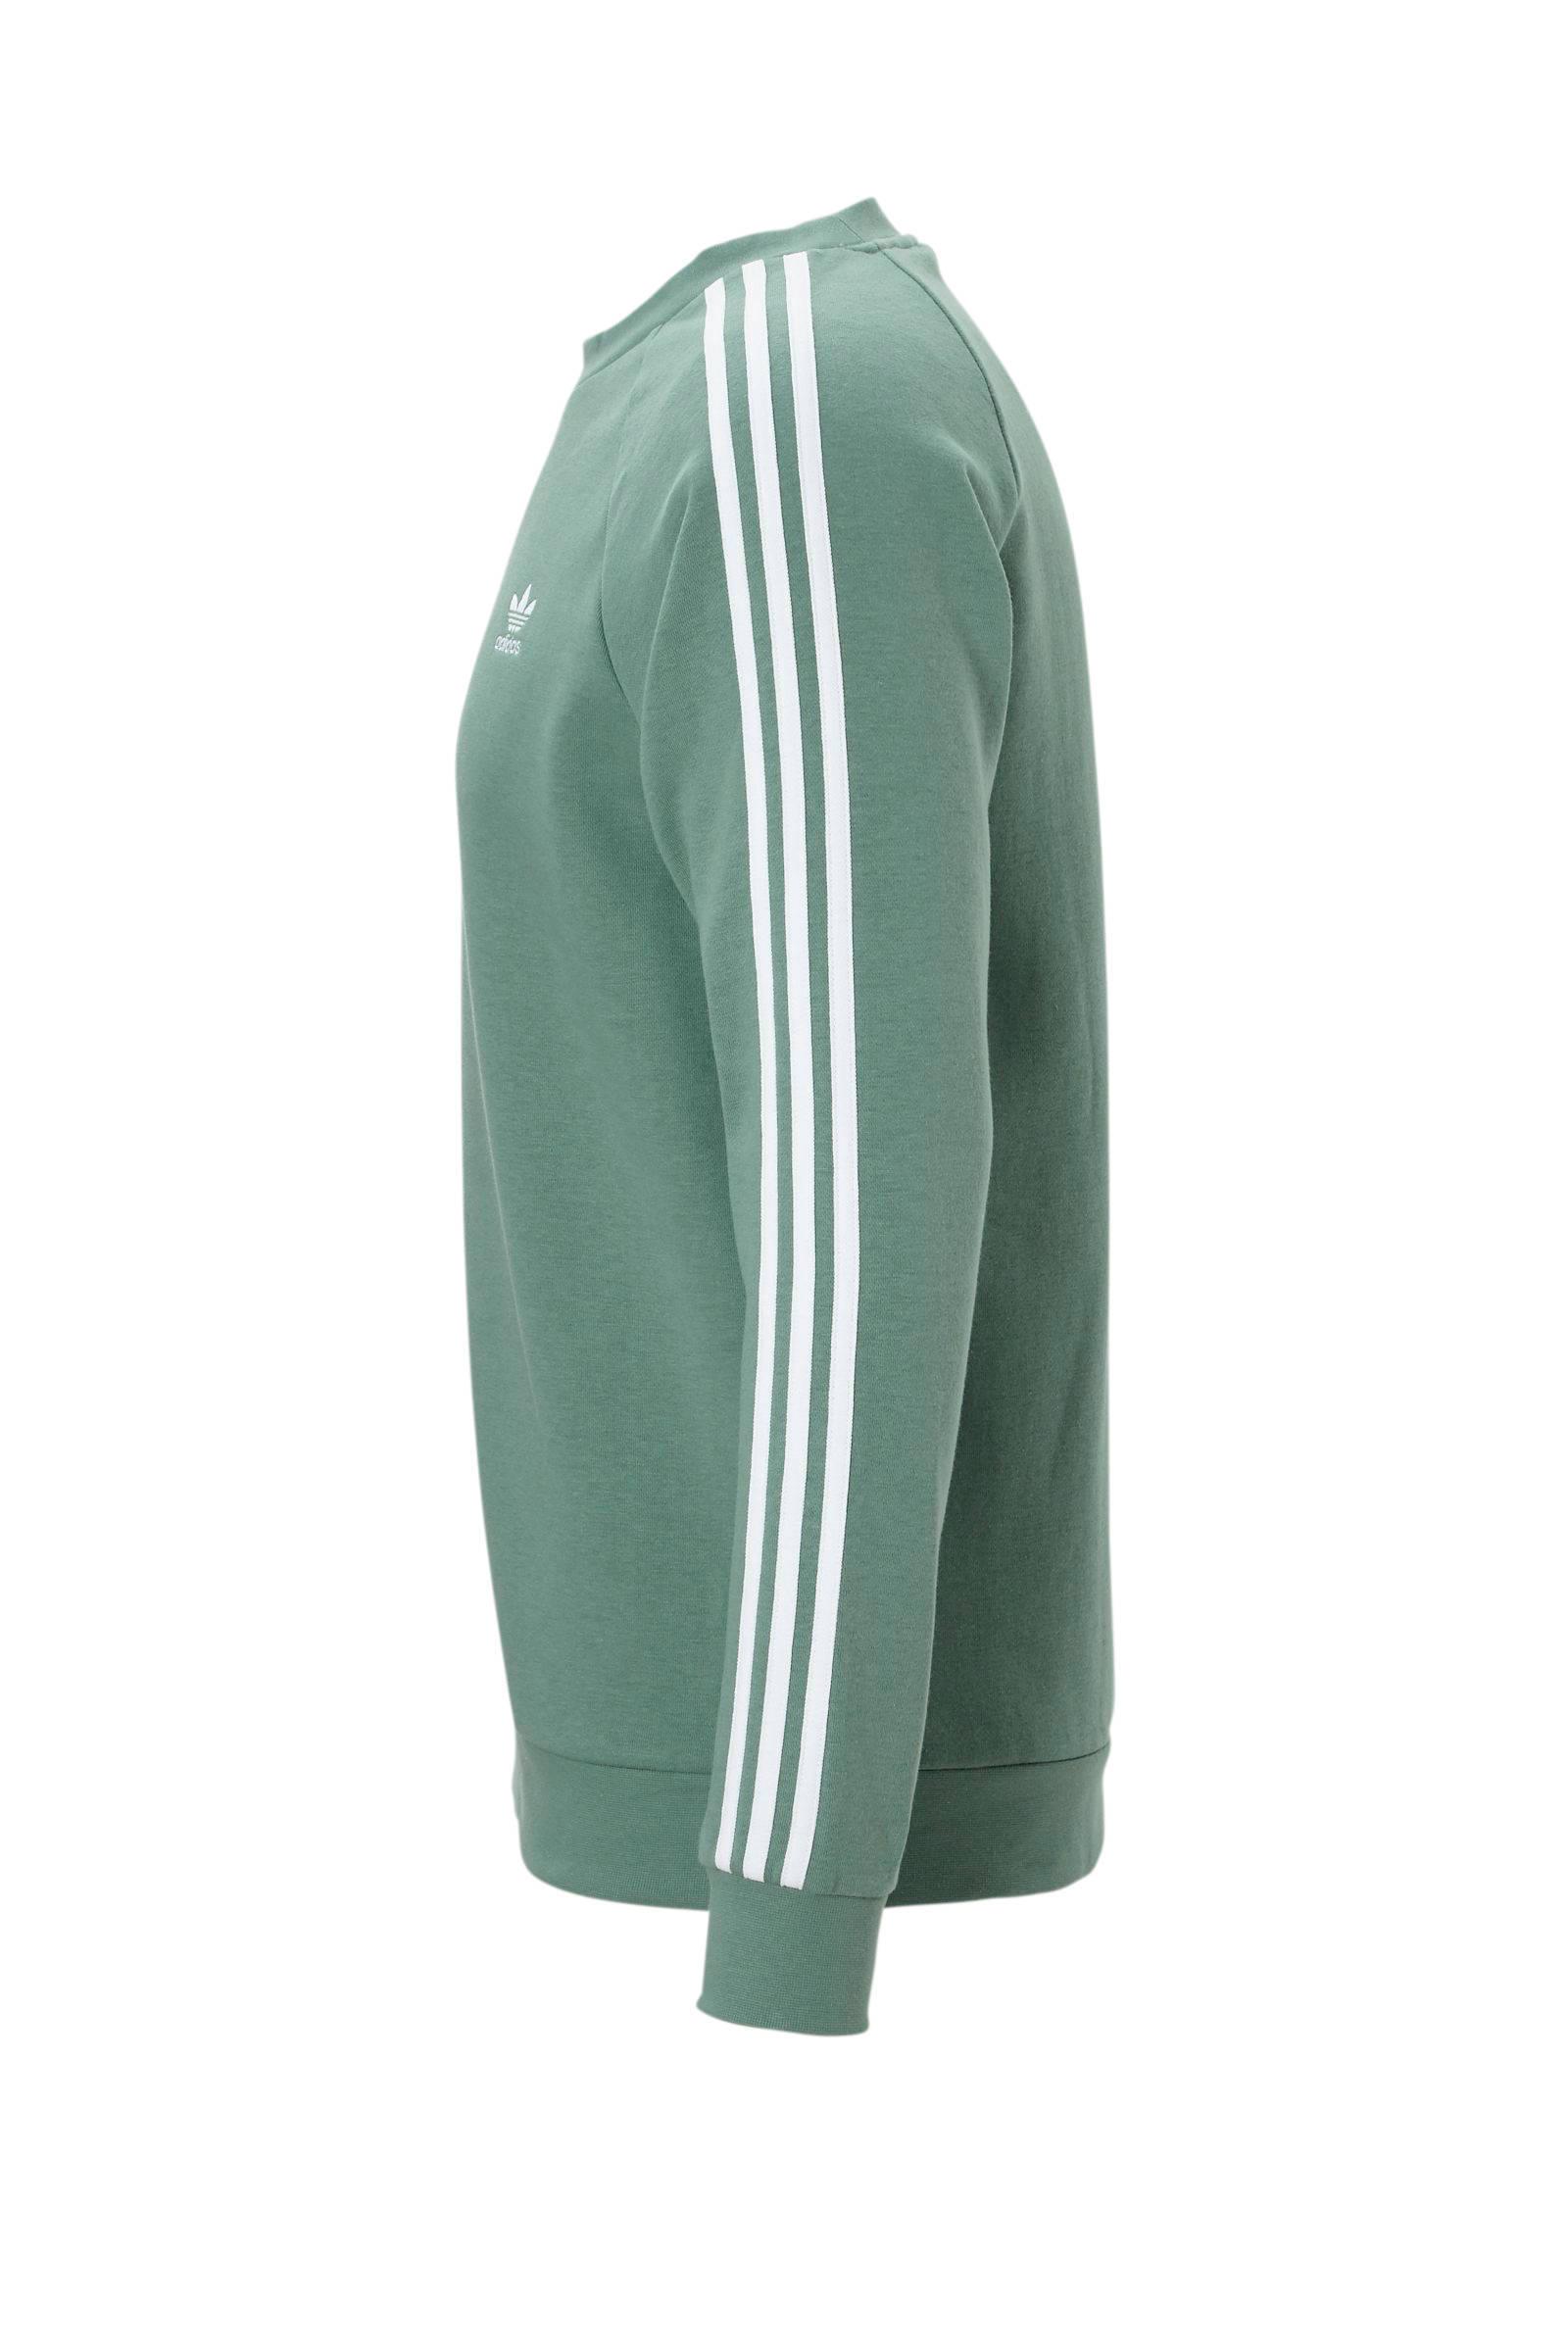 adidas Originals sweater mintgroen | wehkamp